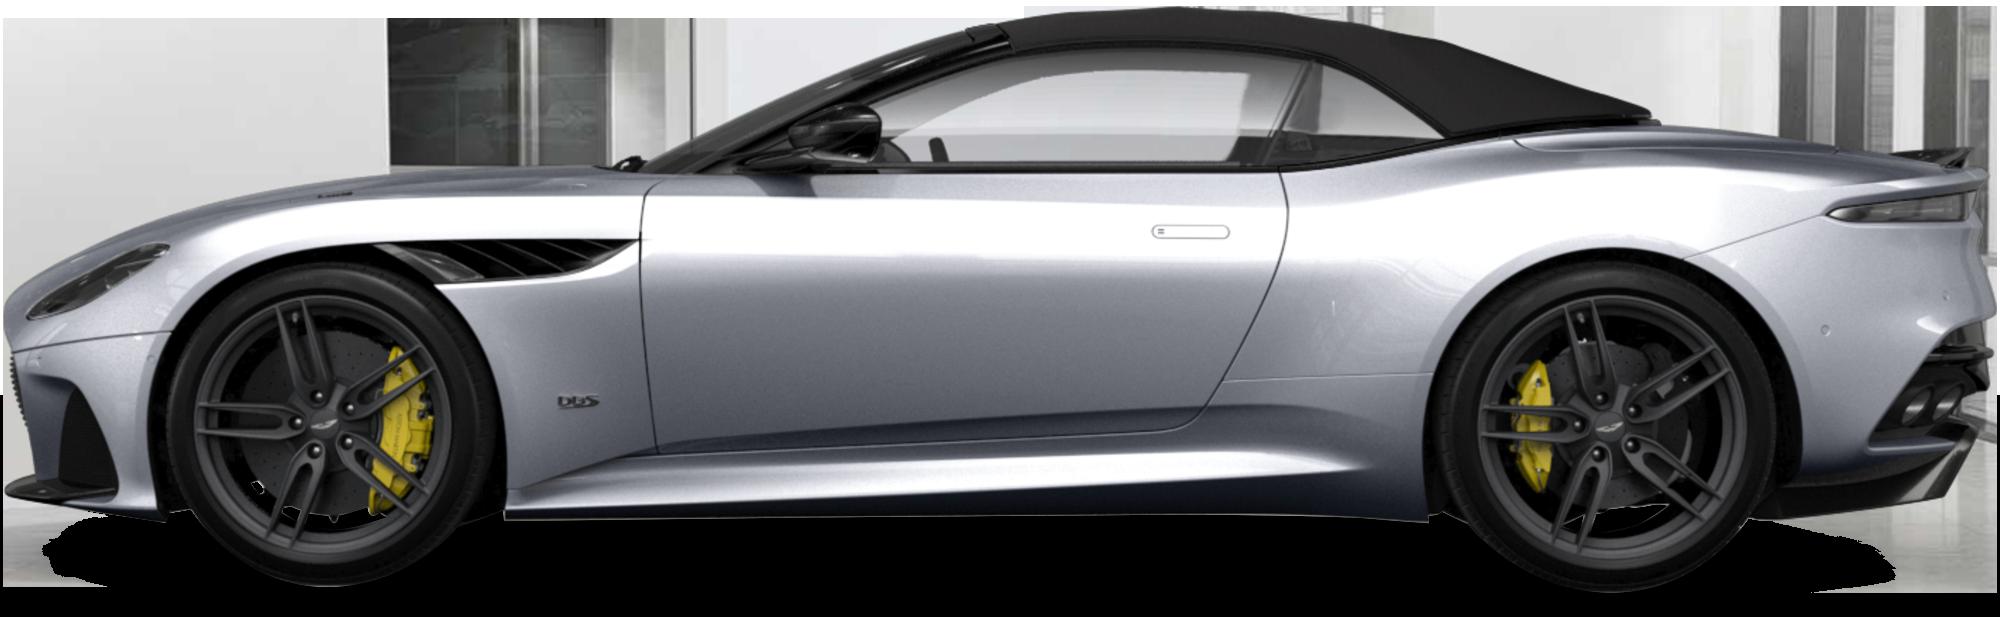 2021 Aston Martin Dbs Convertible Digital Showroom Aston Martin Chicago